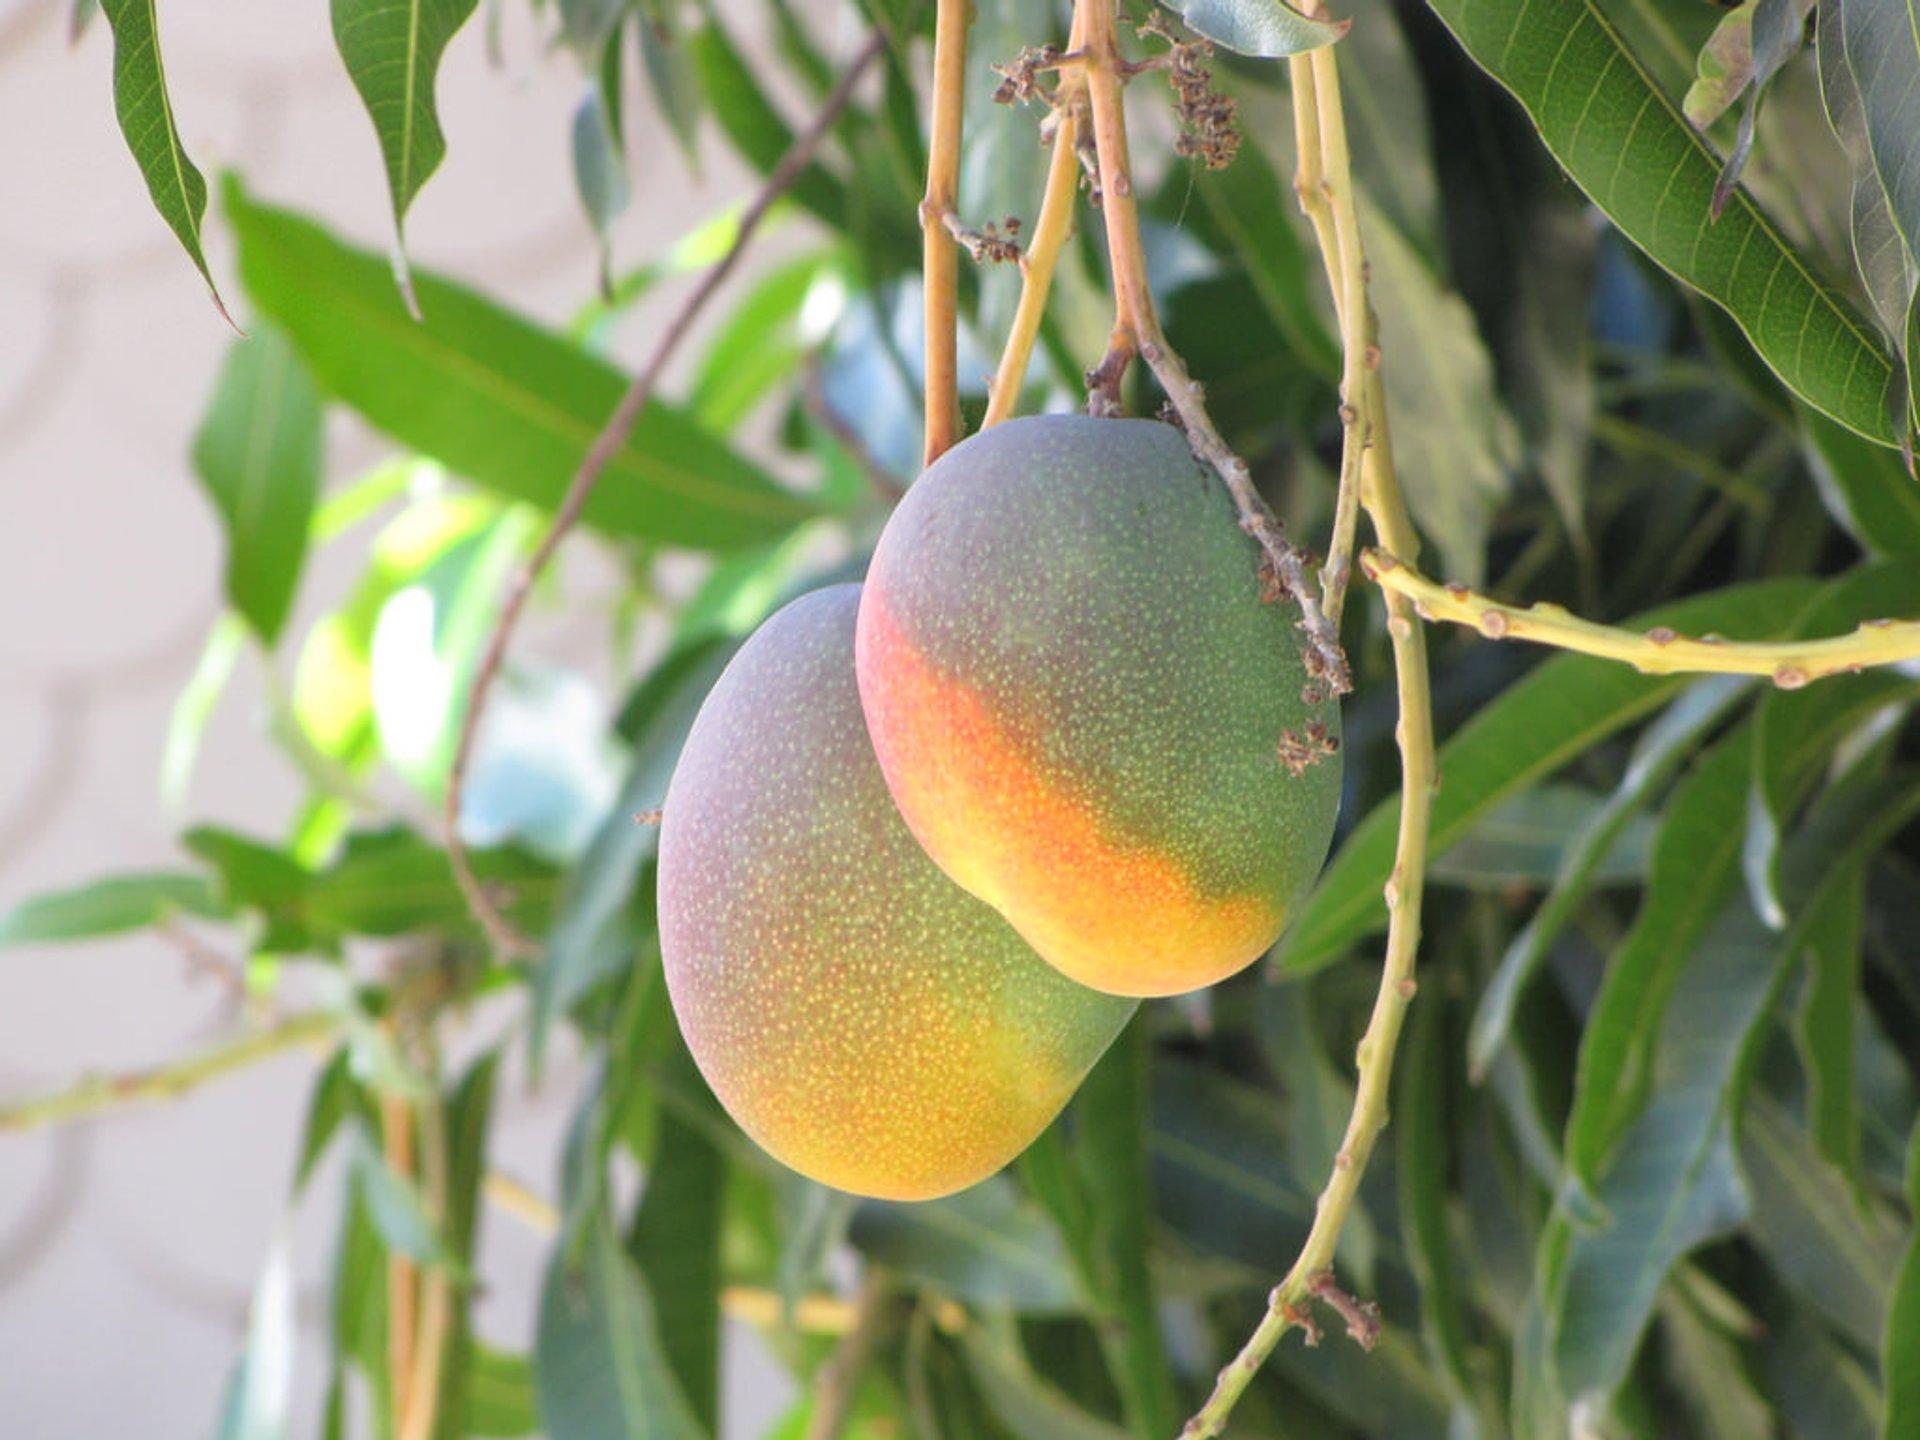 Mango in Hawaii 2020 - Best Time